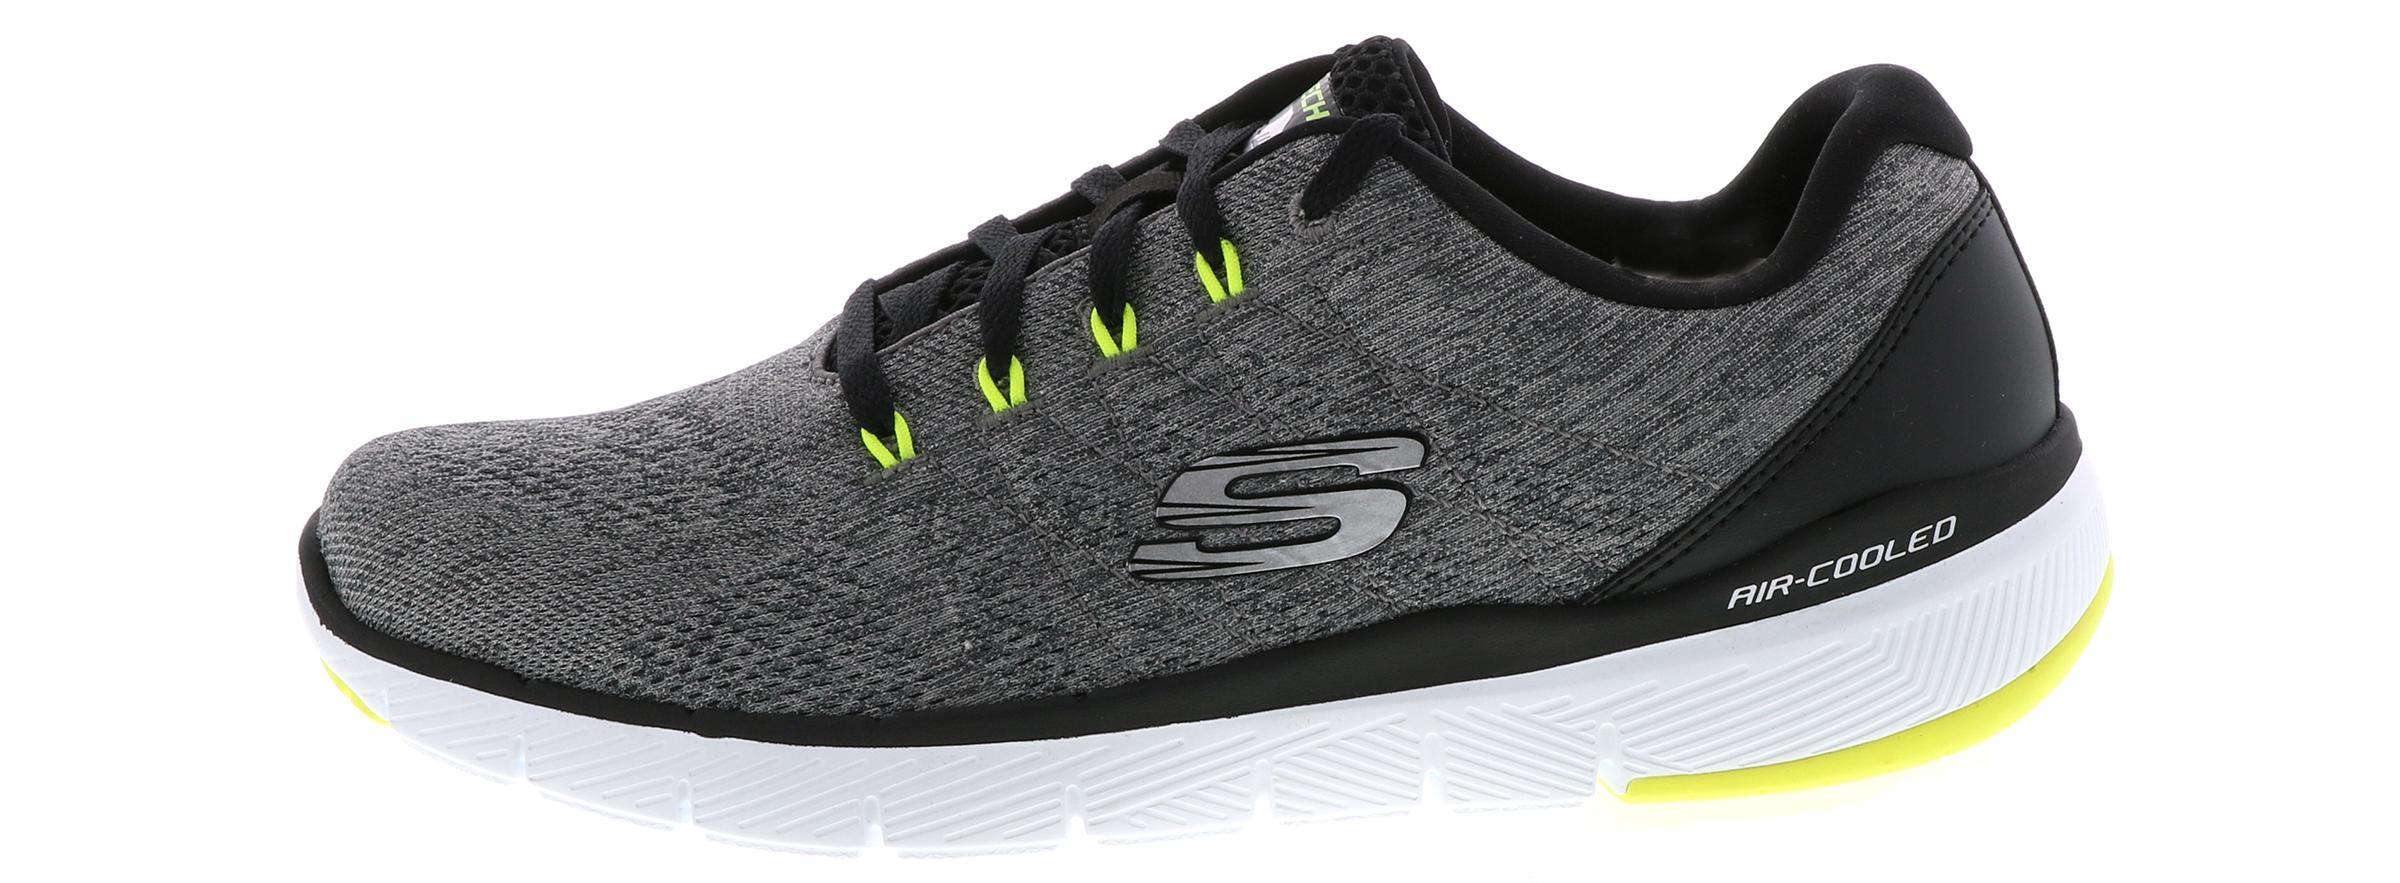 Men's Skechers Flex Advantage 3.0 Stally